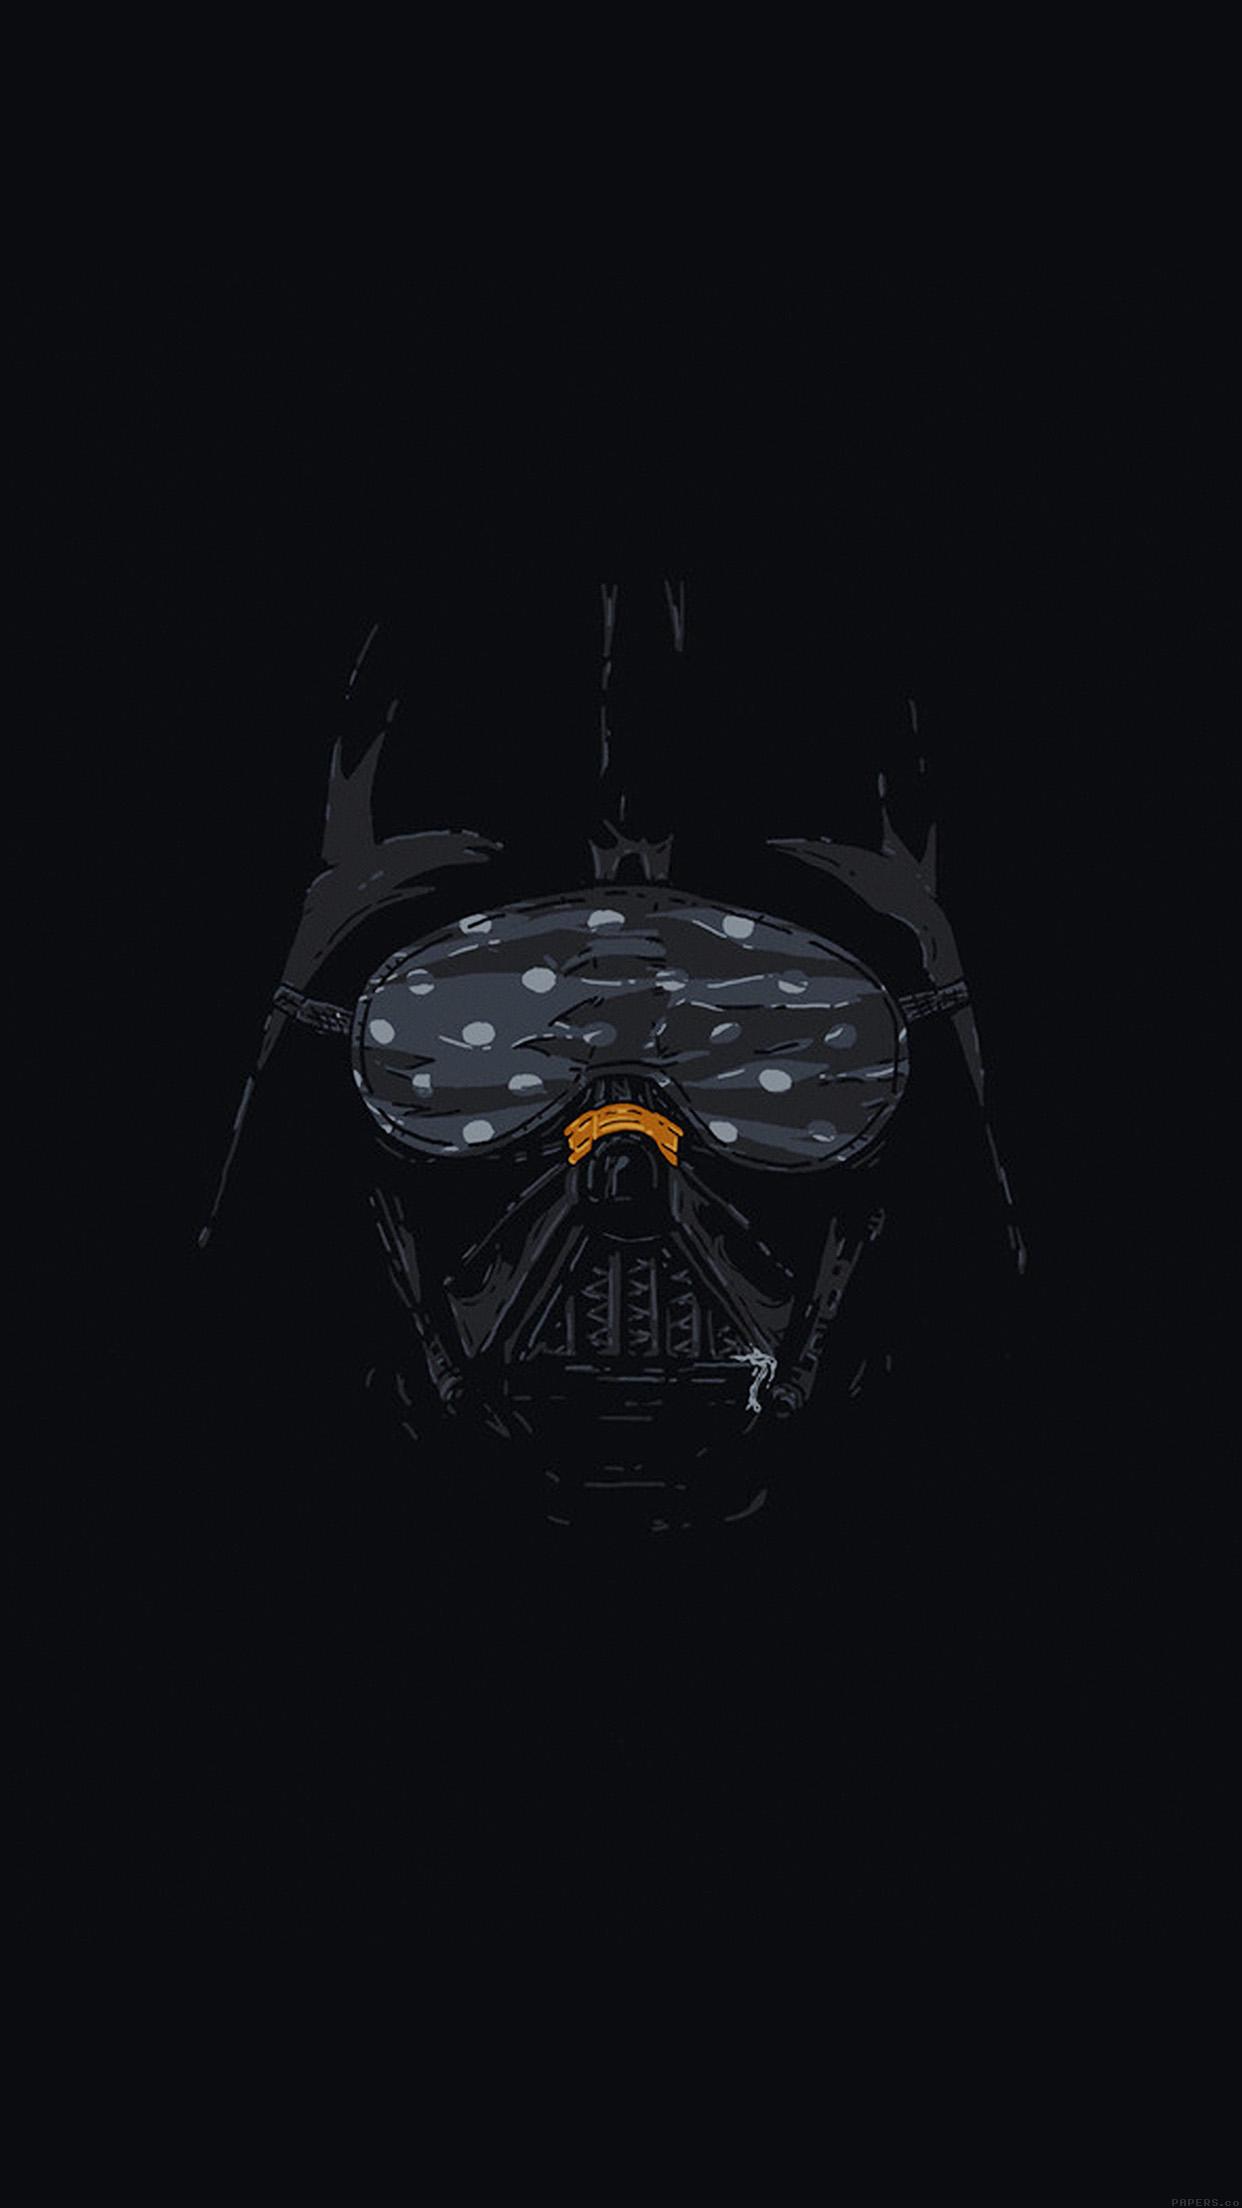 Simple Pubg Wallpaper Ah87 Darth Vader Minimal Starwars Illust Art Papers Co